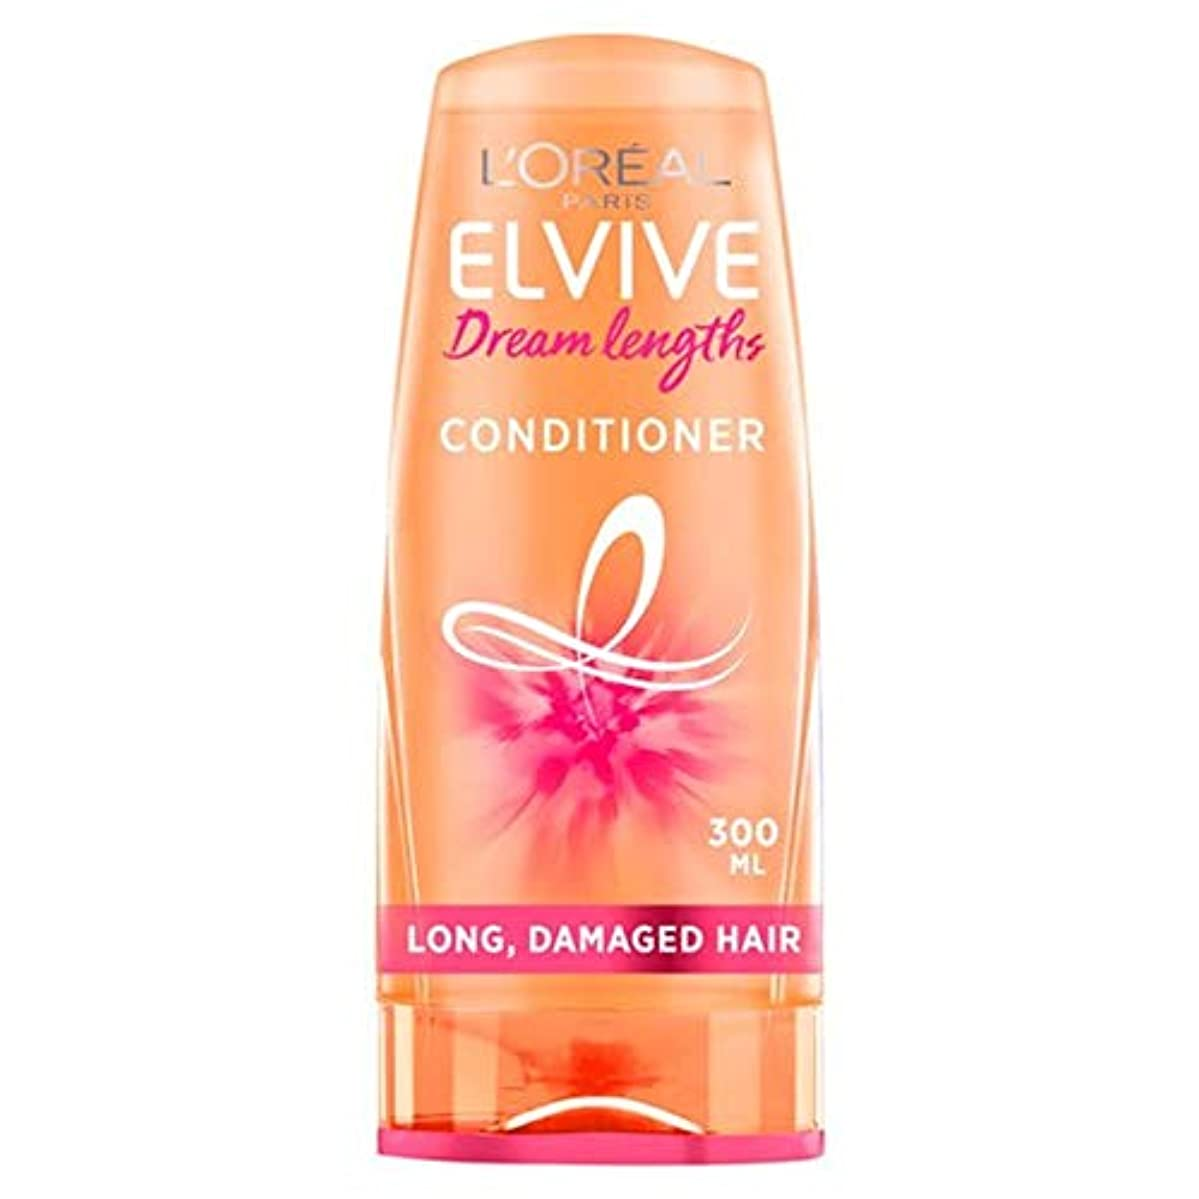 [Elvive] ロレアルはElvive長ヘアコンディショナー300ミリリットルの夢 - L'oreal Elvive Dream Lengths Hair Conditioner 300Ml [並行輸入品]